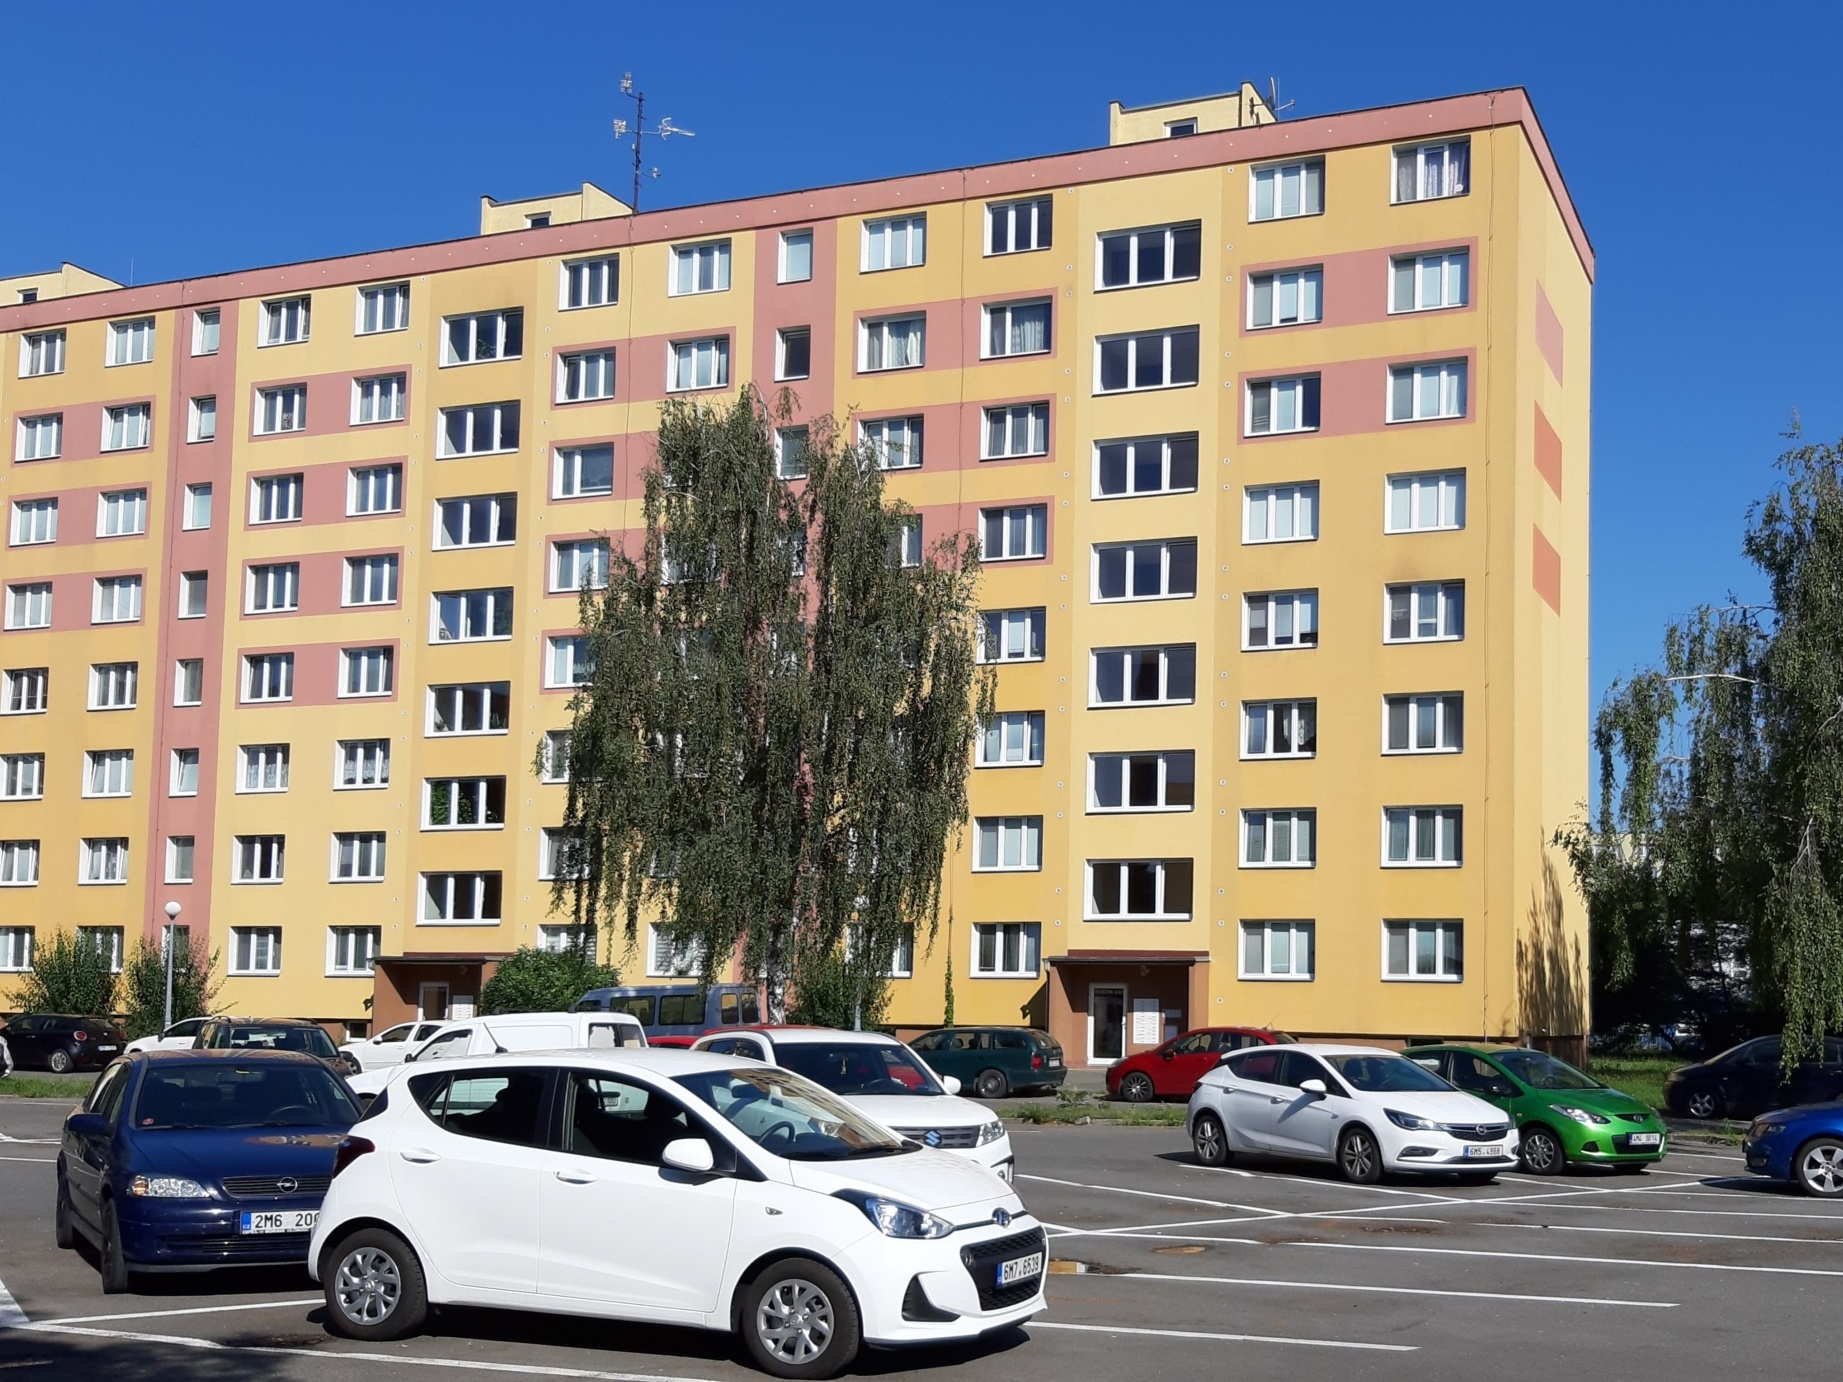 Prodej bytu 2+1 v Olomouci